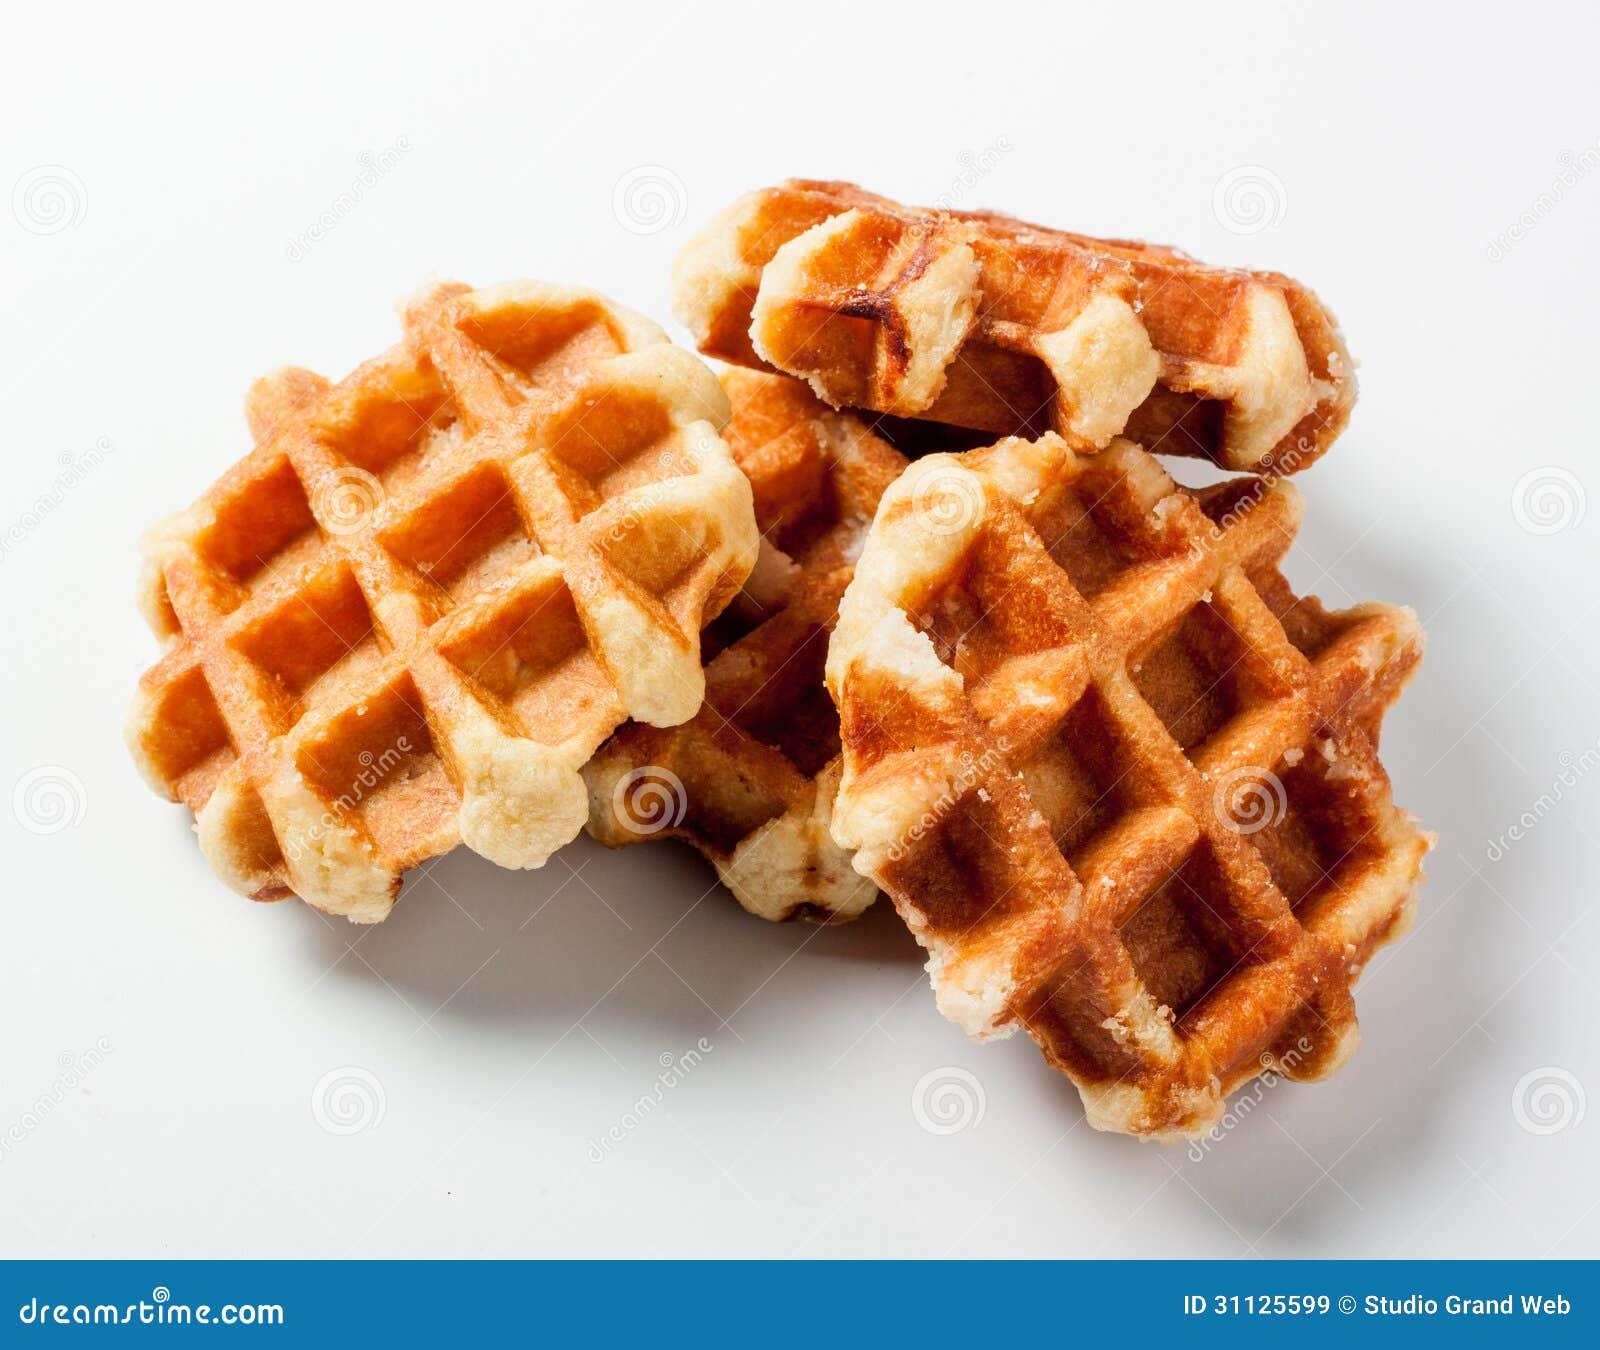 Belgian Waffles For Dessert Royalty Free Stock Images - Image ...